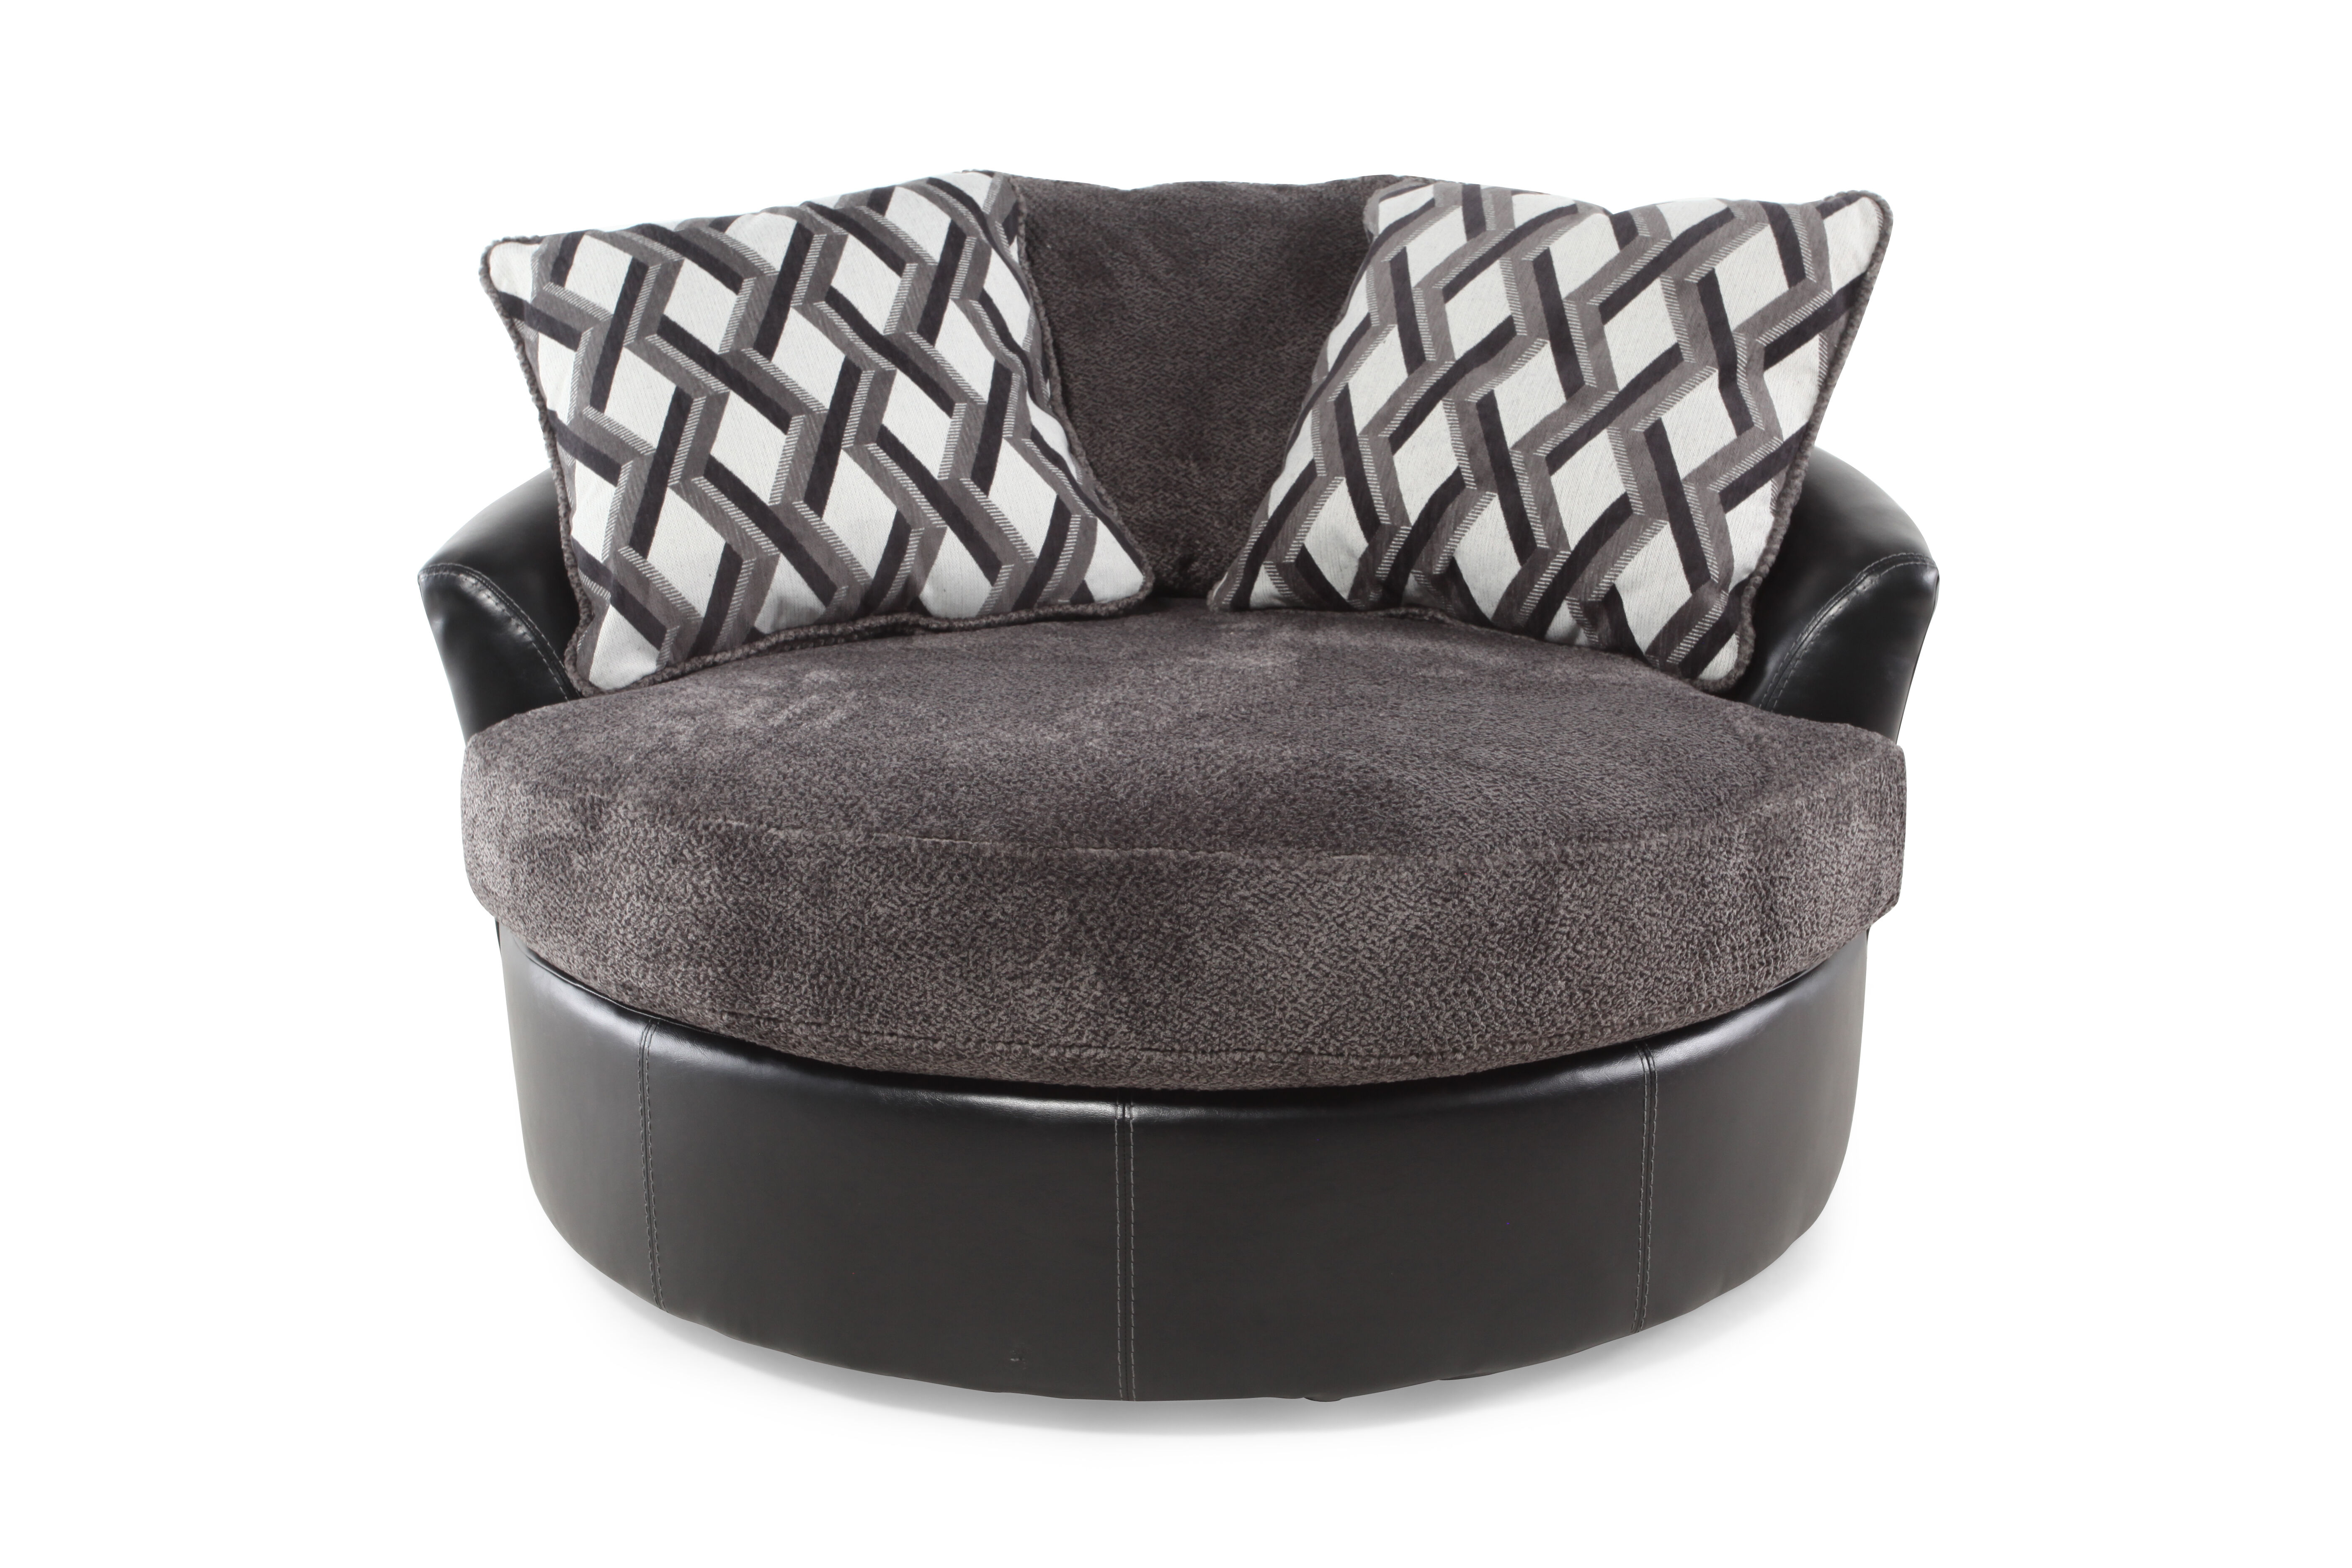 Images Oversized Microfiber 58u0026quot; Swivel Accent Chair In Smoke Gray  Oversized Microfiber 58u0026quot; Swivel Accent Chair In Smoke Gray